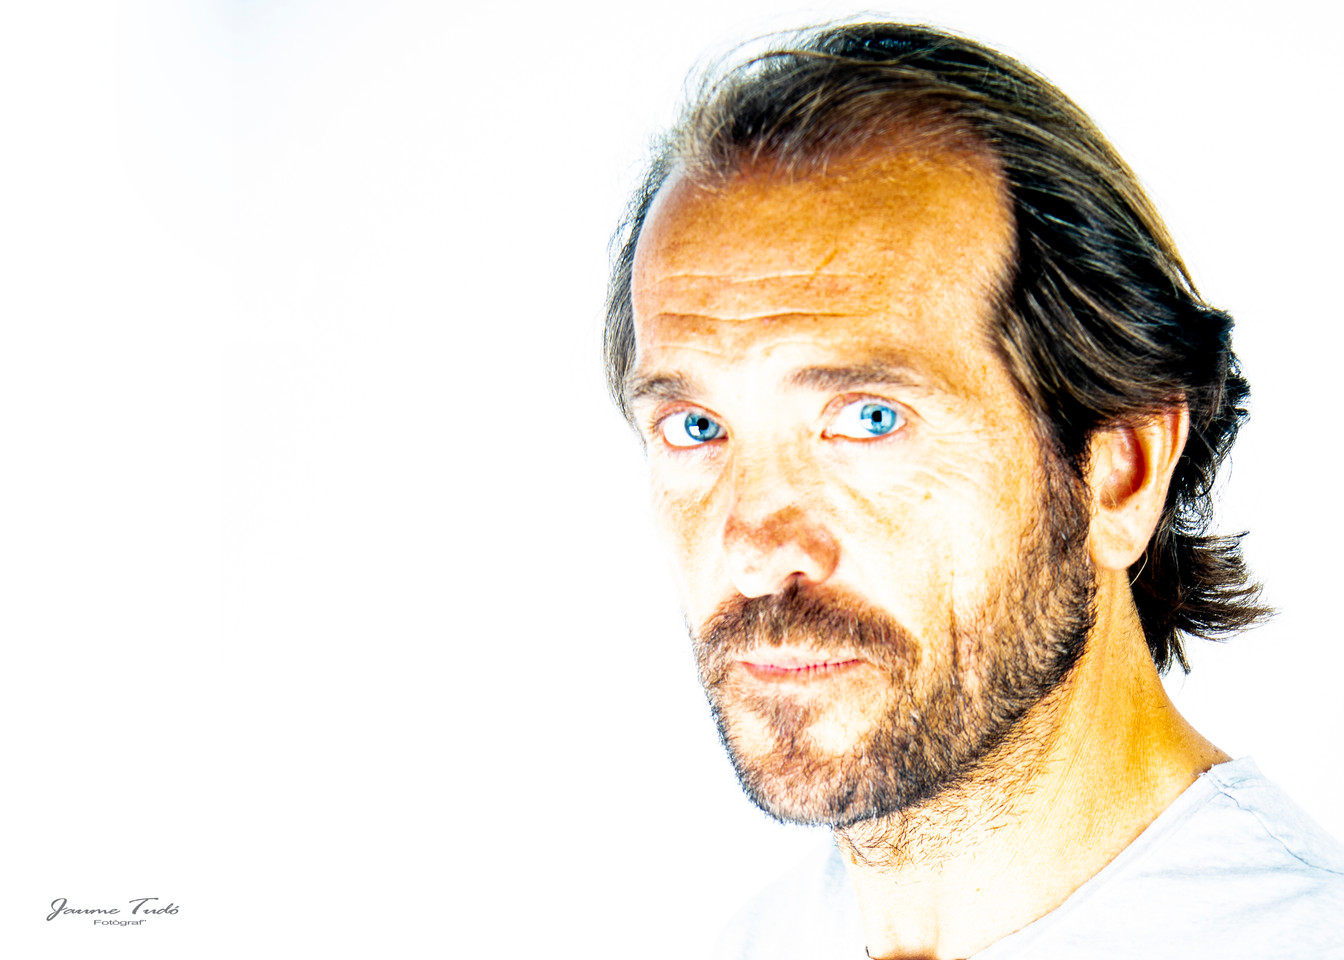 Victor Sole perfil (2).jpg